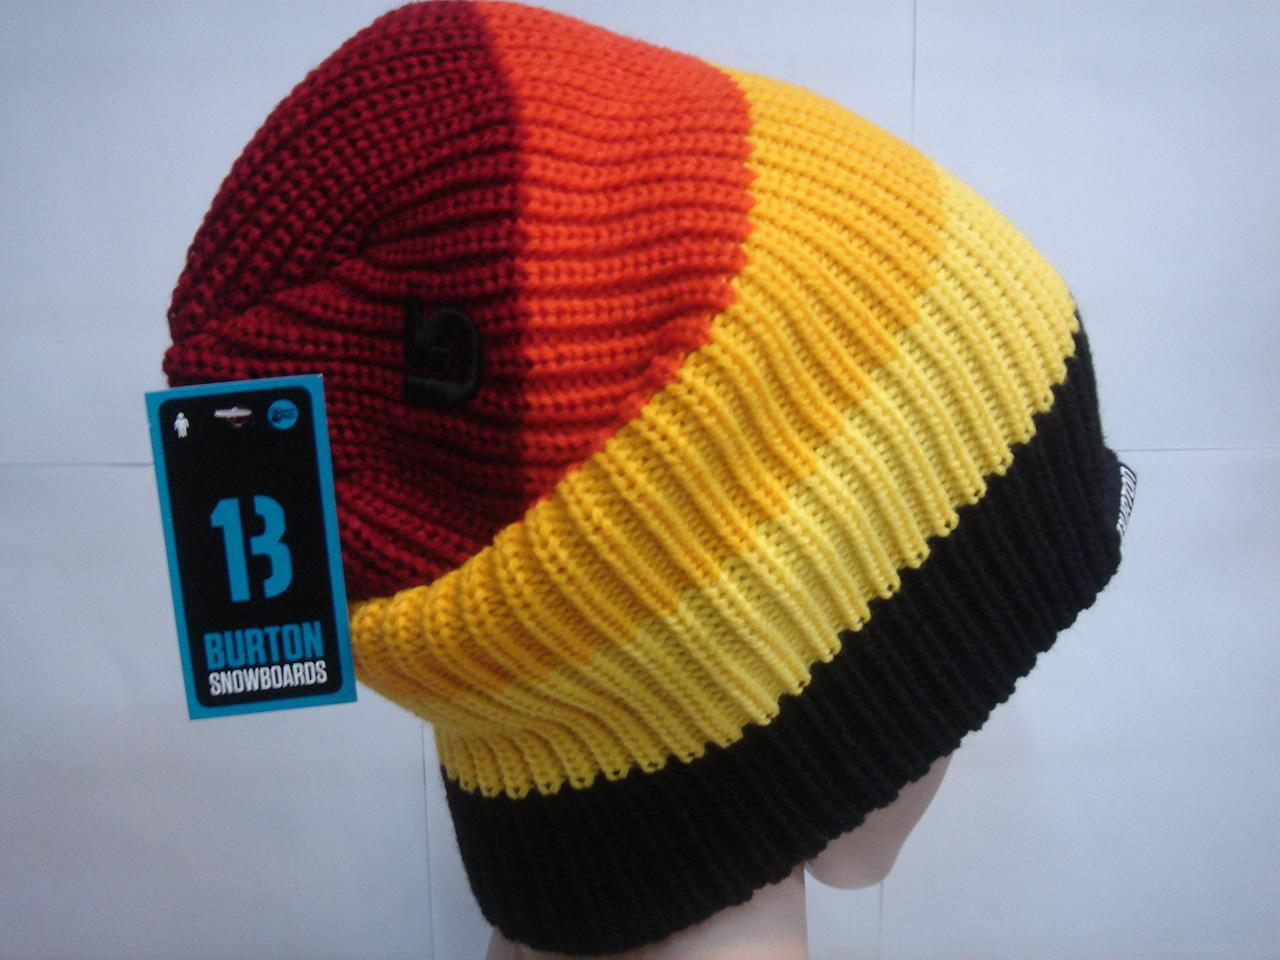 BURTON 0062 SKULL CAP Winter Snowboard Ski Acrylic Hat Beanie. Beanie Kids  Skull Caps From Dingyi313 b28ca879b40